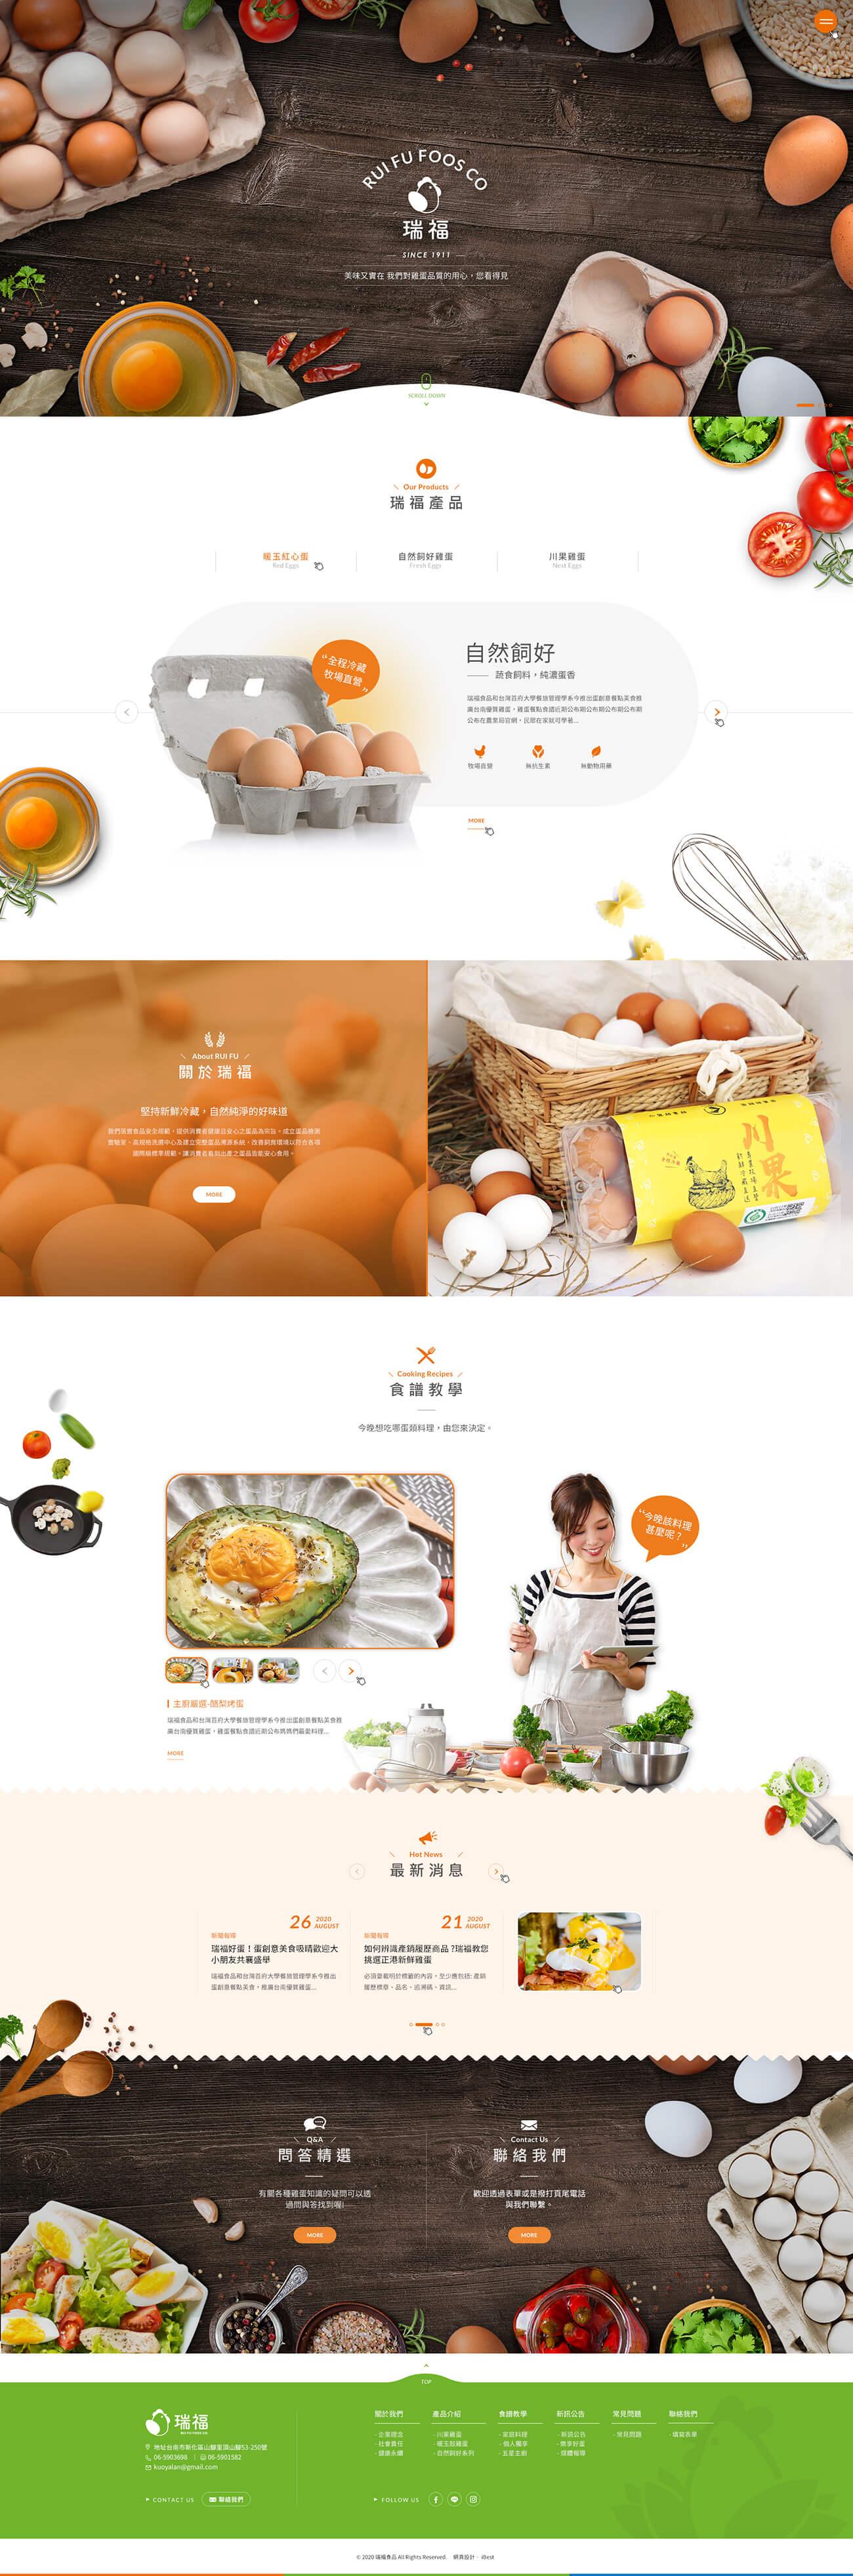 瑞福食品-網頁設計